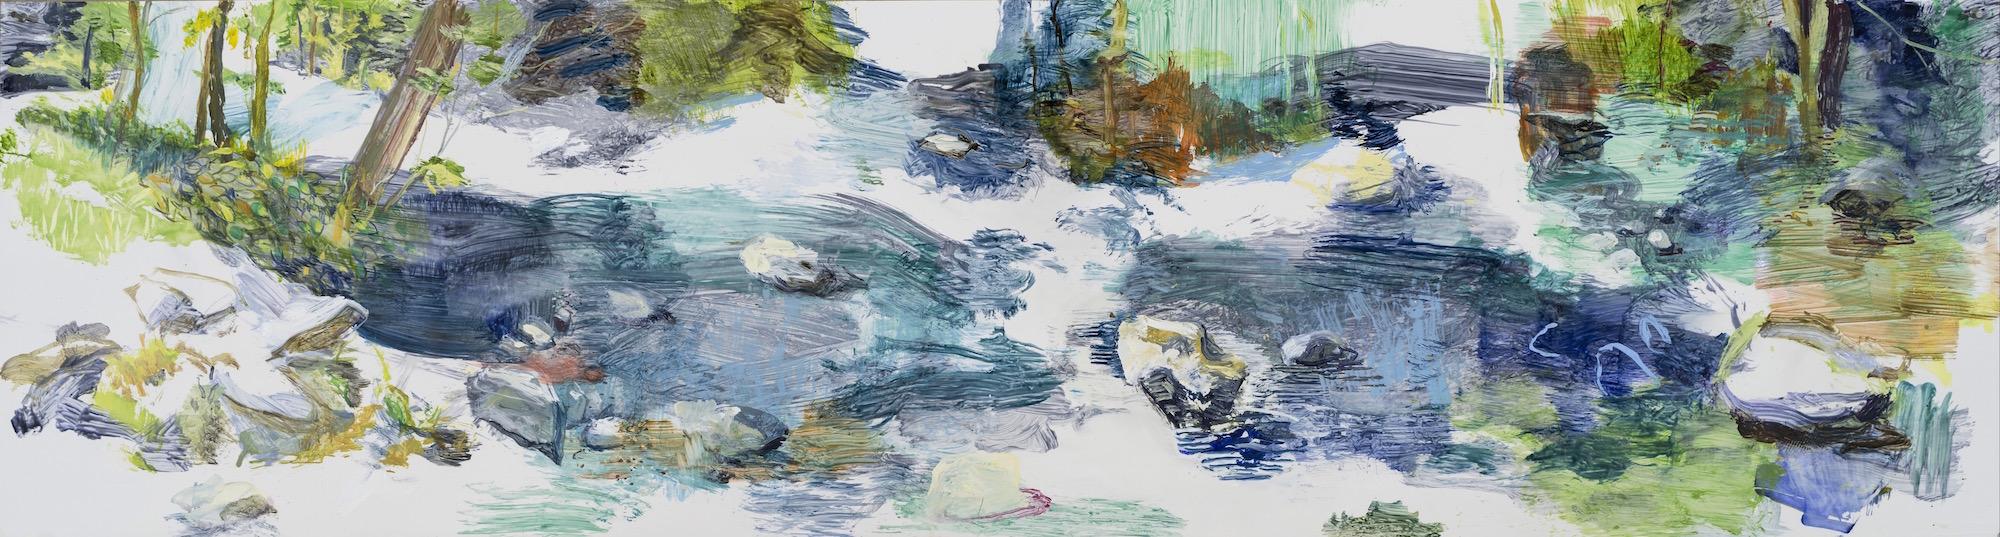 SUSAN G SCOTT At Rest,  2016, Huile sur Terraskin | oil on Terraskin, 50.8 x 182.88 | 20″ x 72″ CAD $7,360 (sans encadrement / unframed)